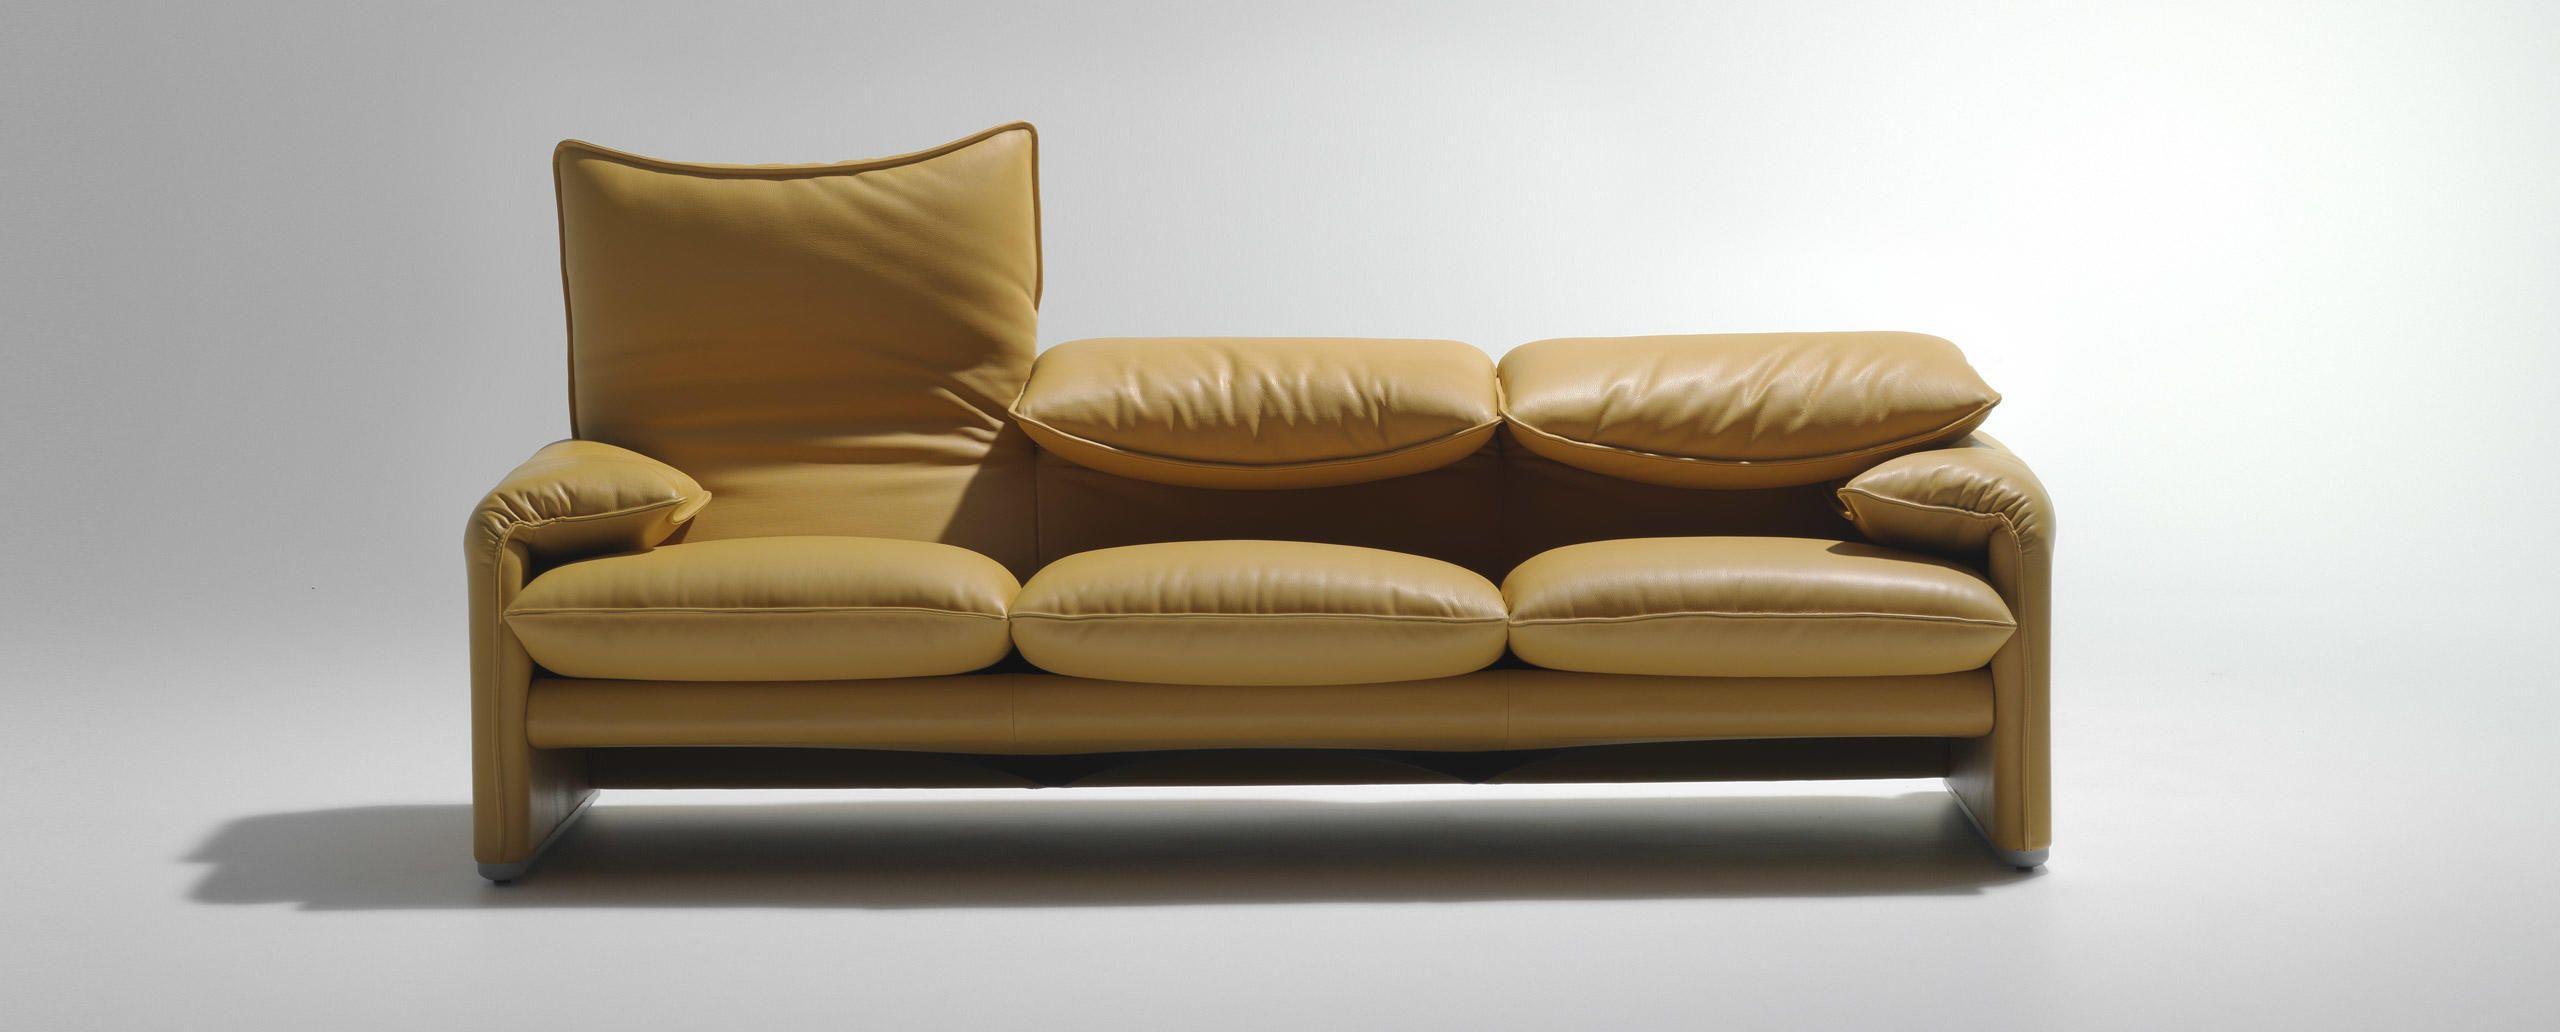 1970s Italian Modern Maralunga Chair Vico Magistretti Cassina Excellent In Quality